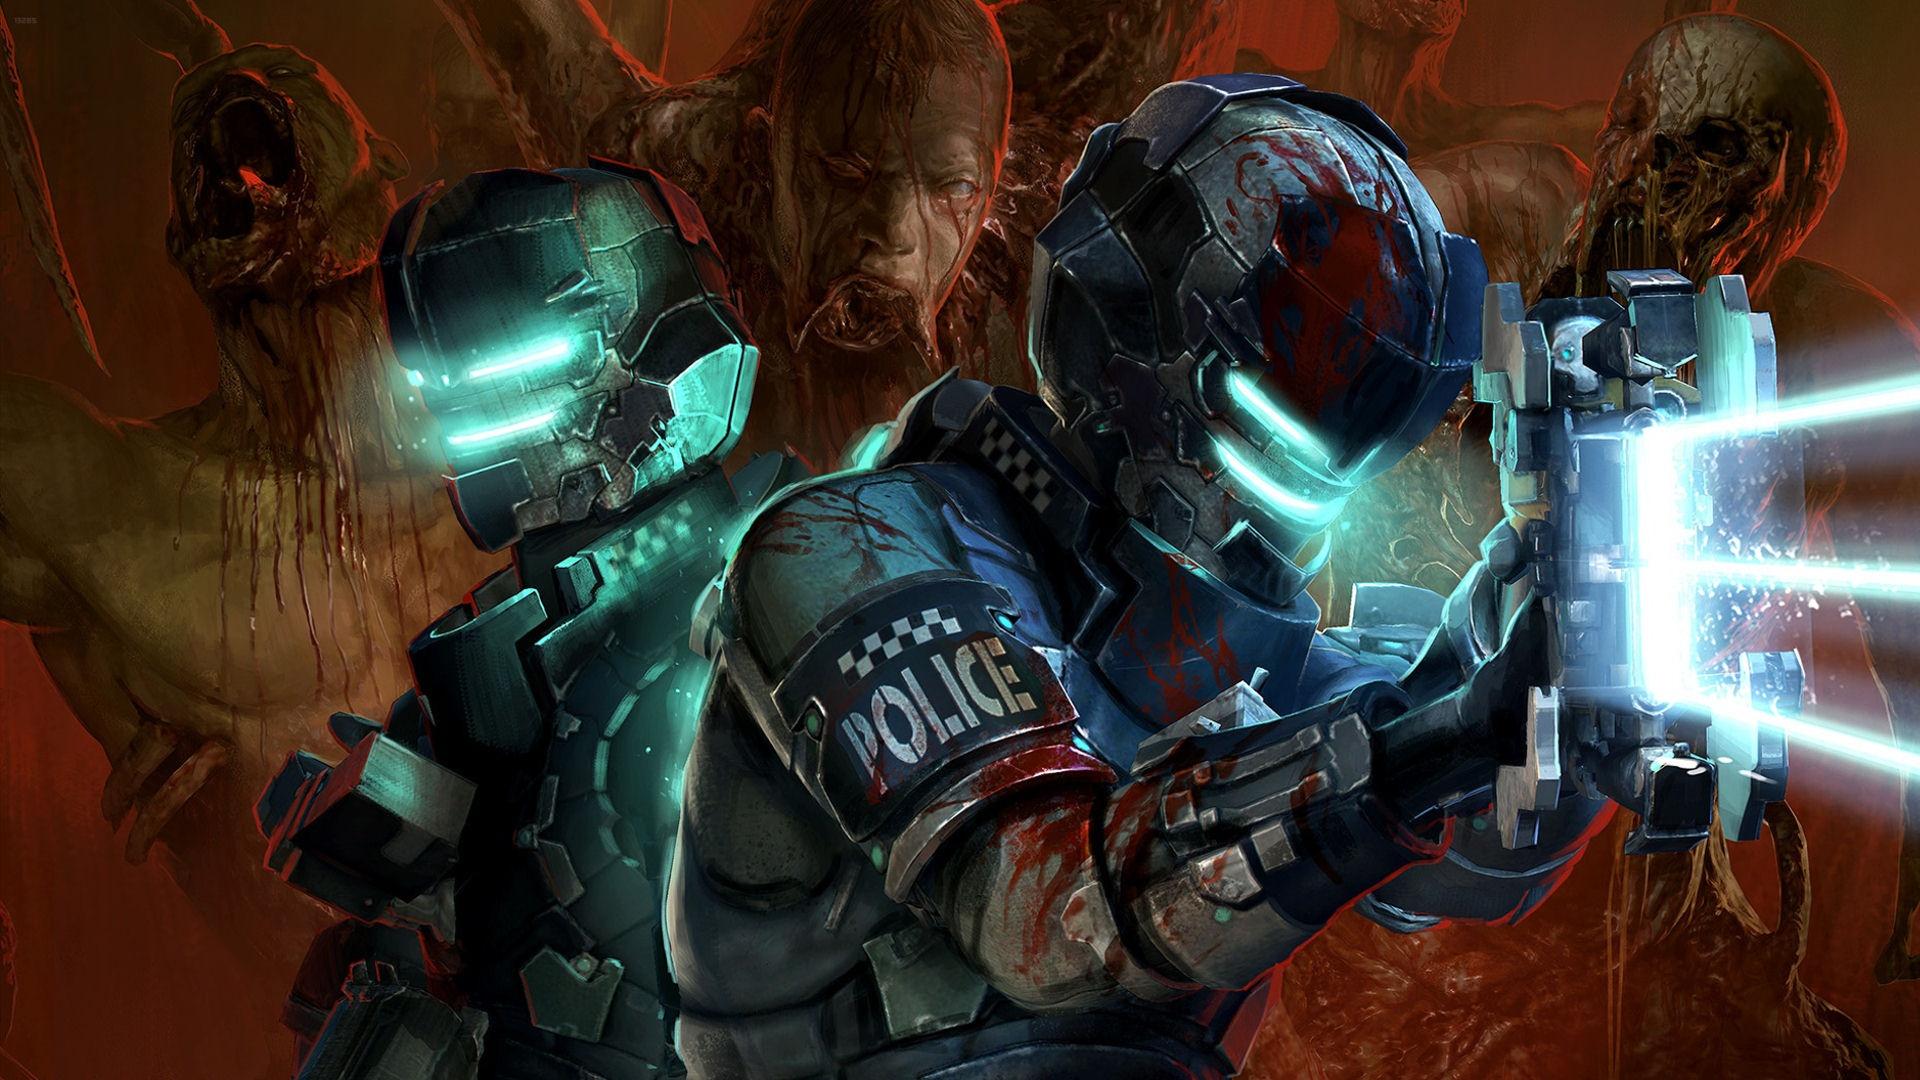 Isaac Clarke Dead Space 2 1093404 Hd Wallpaper Backgrounds